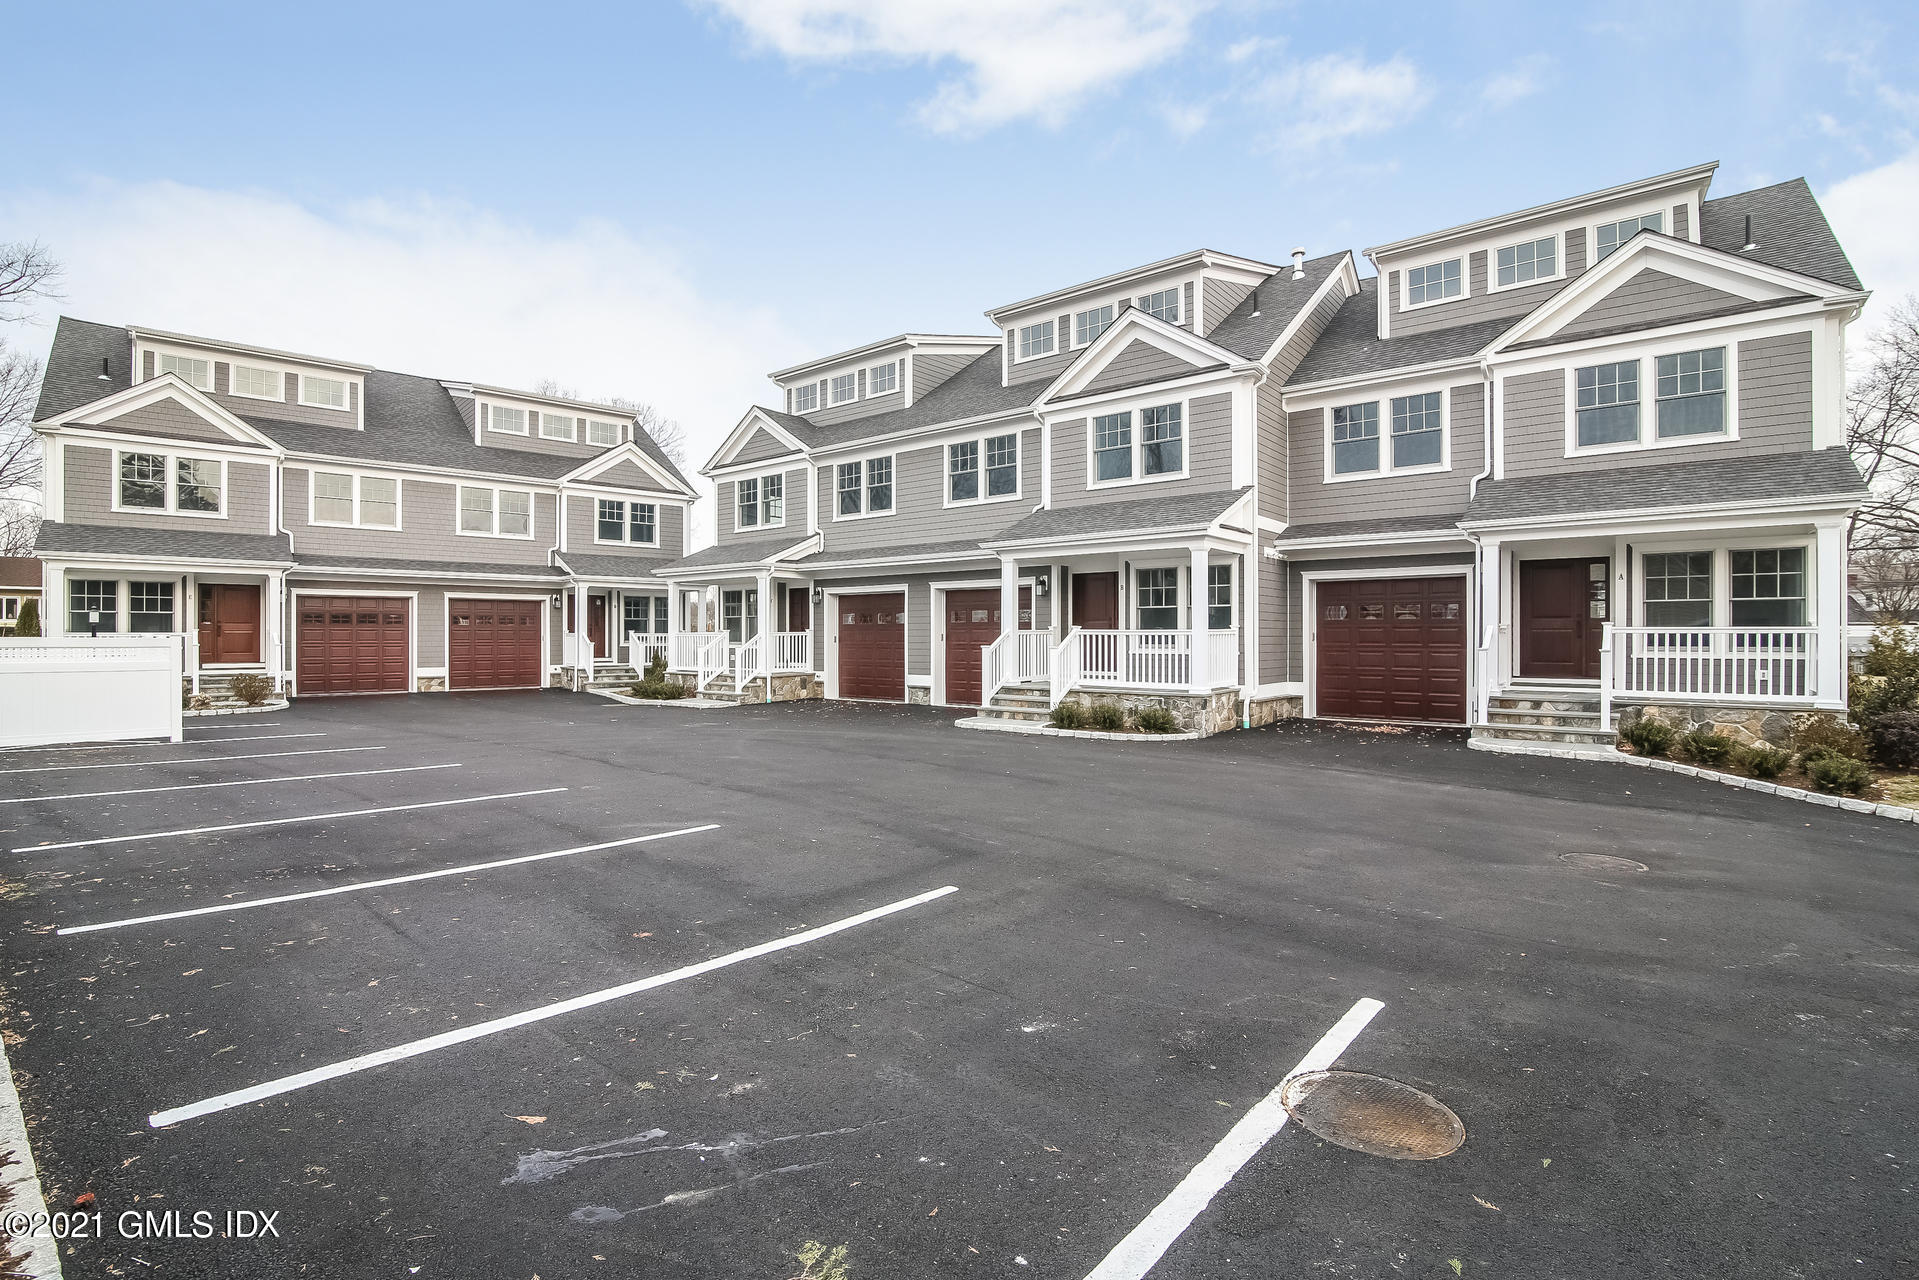 16 Hawthorne Street, Greenwich, Connecticut 06831, 3 Bedrooms Bedrooms, ,2 BathroomsBathrooms,Condominium,For sale,Hawthorne,112273